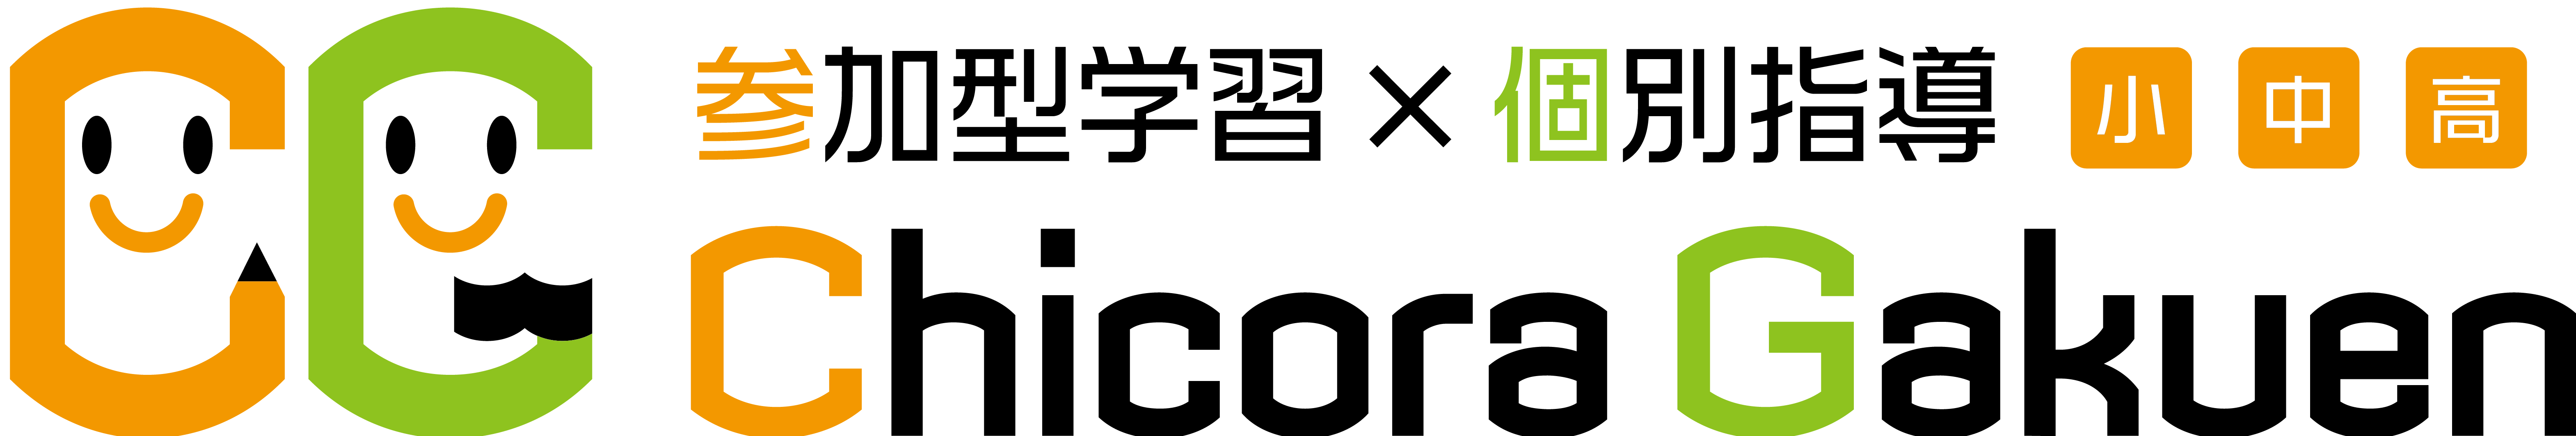 Chicora学園(チコラ学園)ホームページ